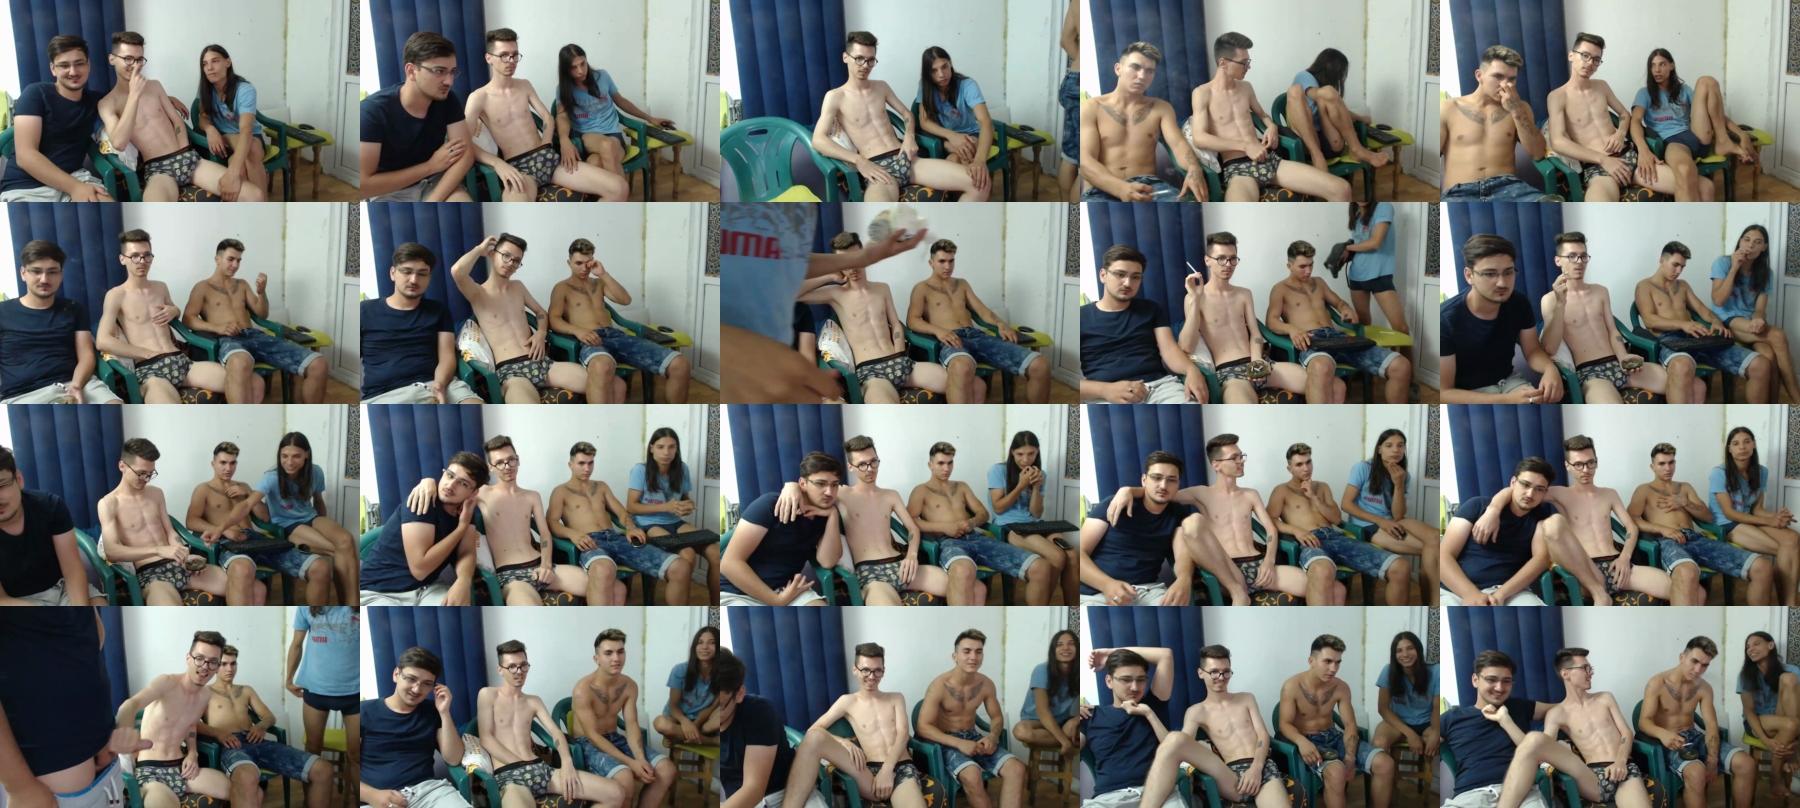 Tino_Axel Porn CAM SHOW @ Chaturbate 20-07-2021